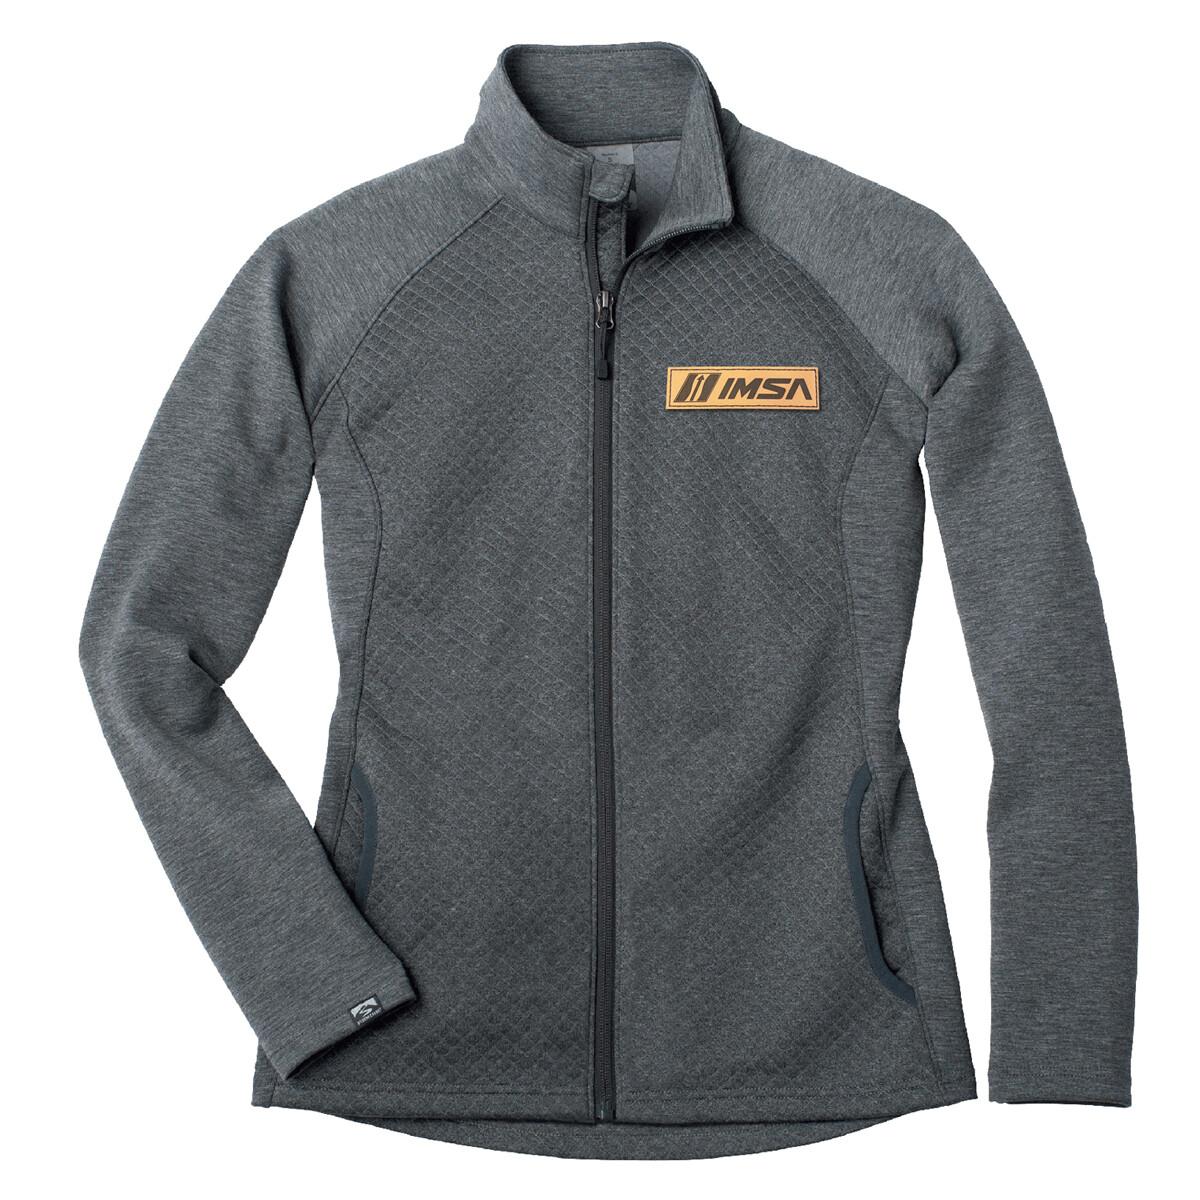 IMSA Ladies Diamond Fleece Full Zip Jacket - Rich Grey